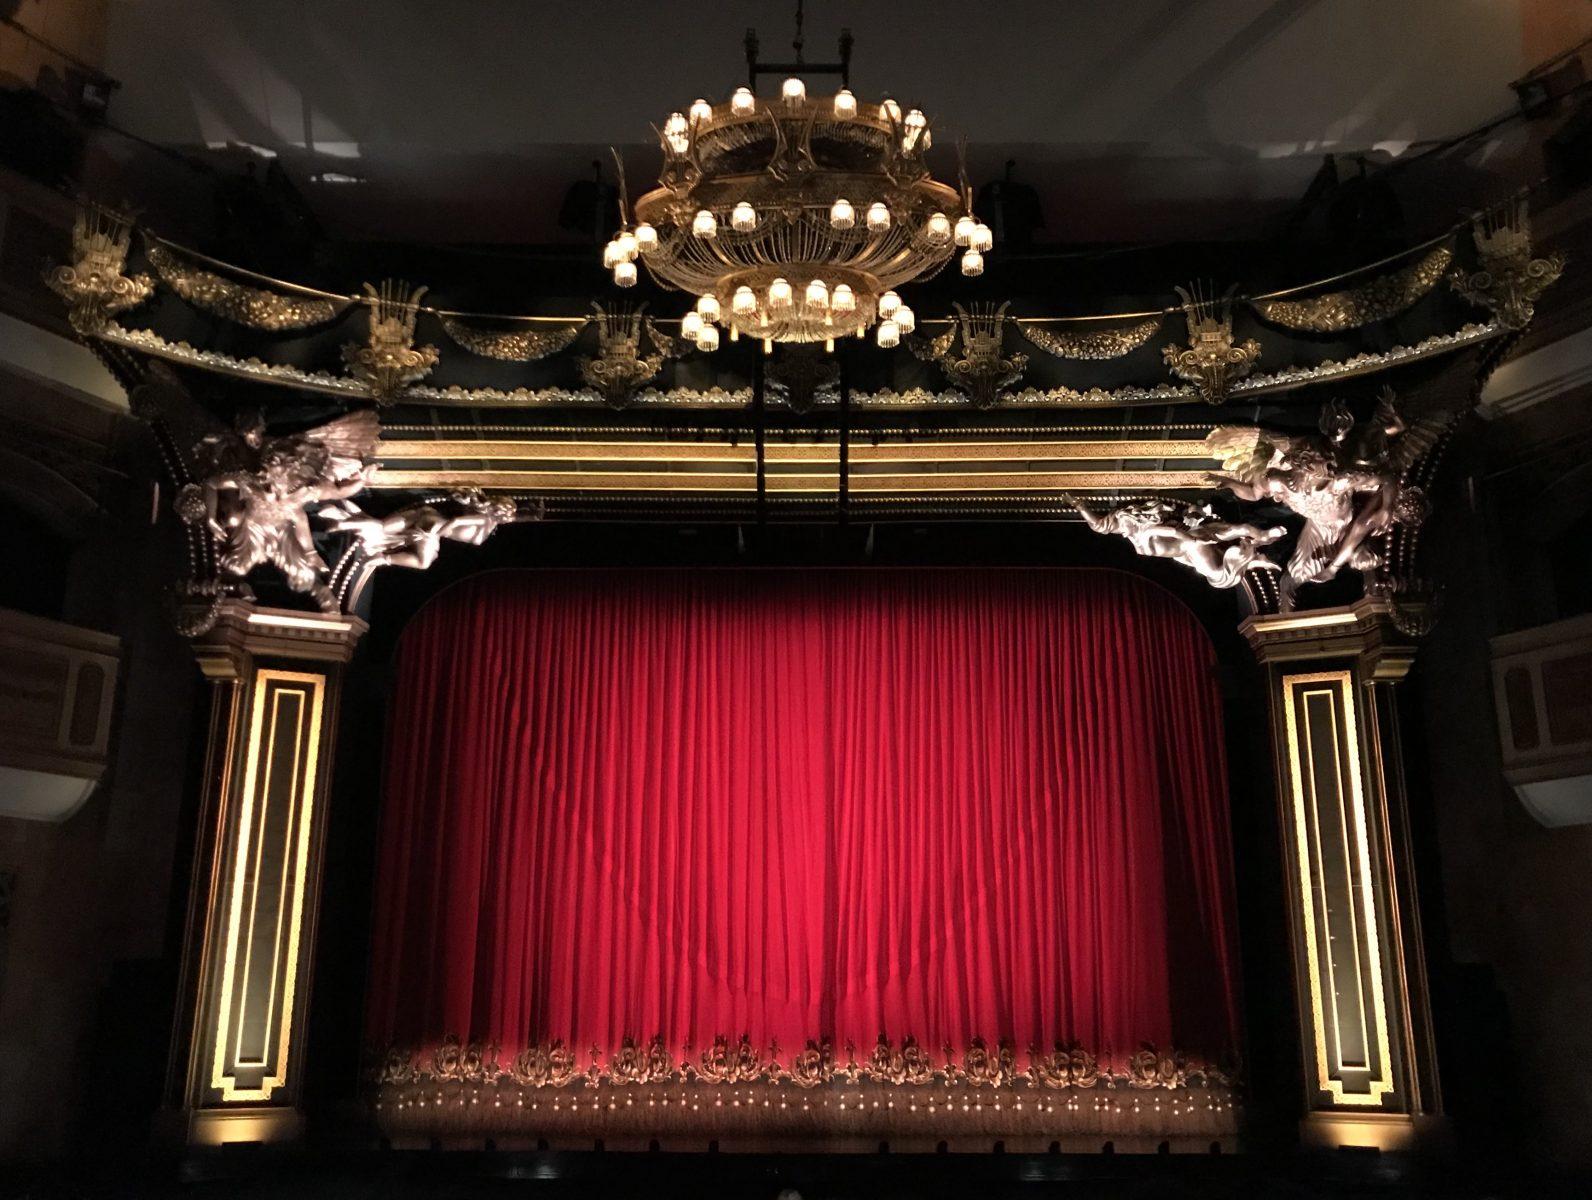 m3th3riq9 w - Broadway and the Theater District